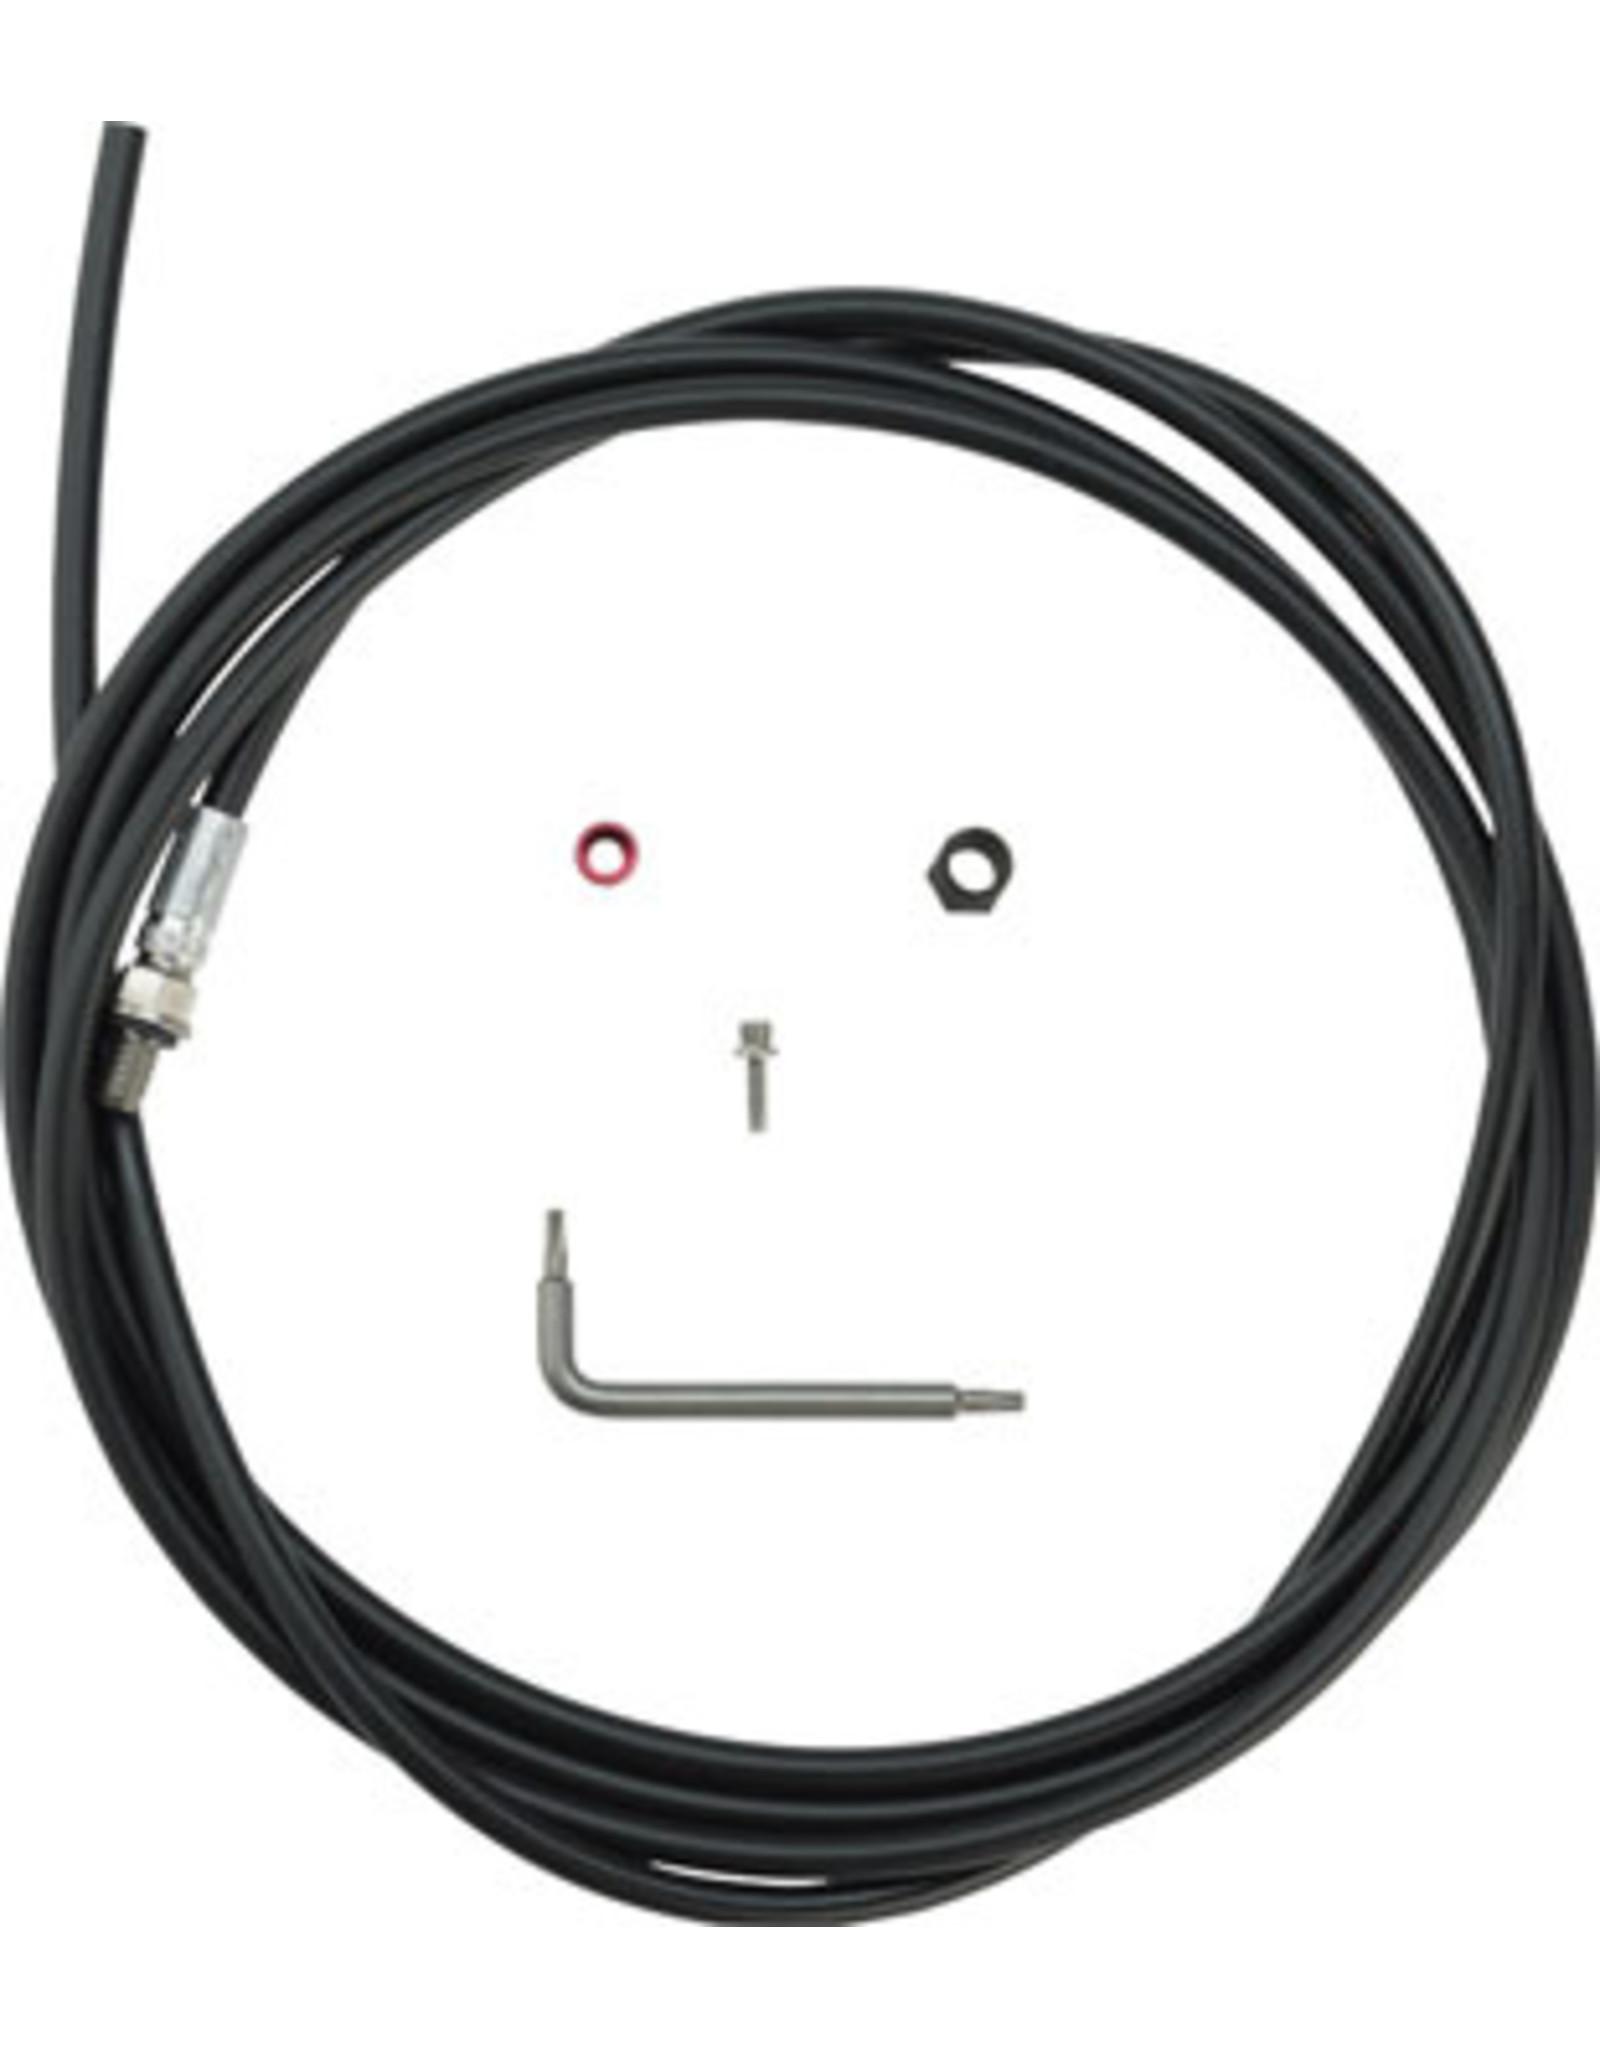 Avid Hydraulic Line Kit Black 2M